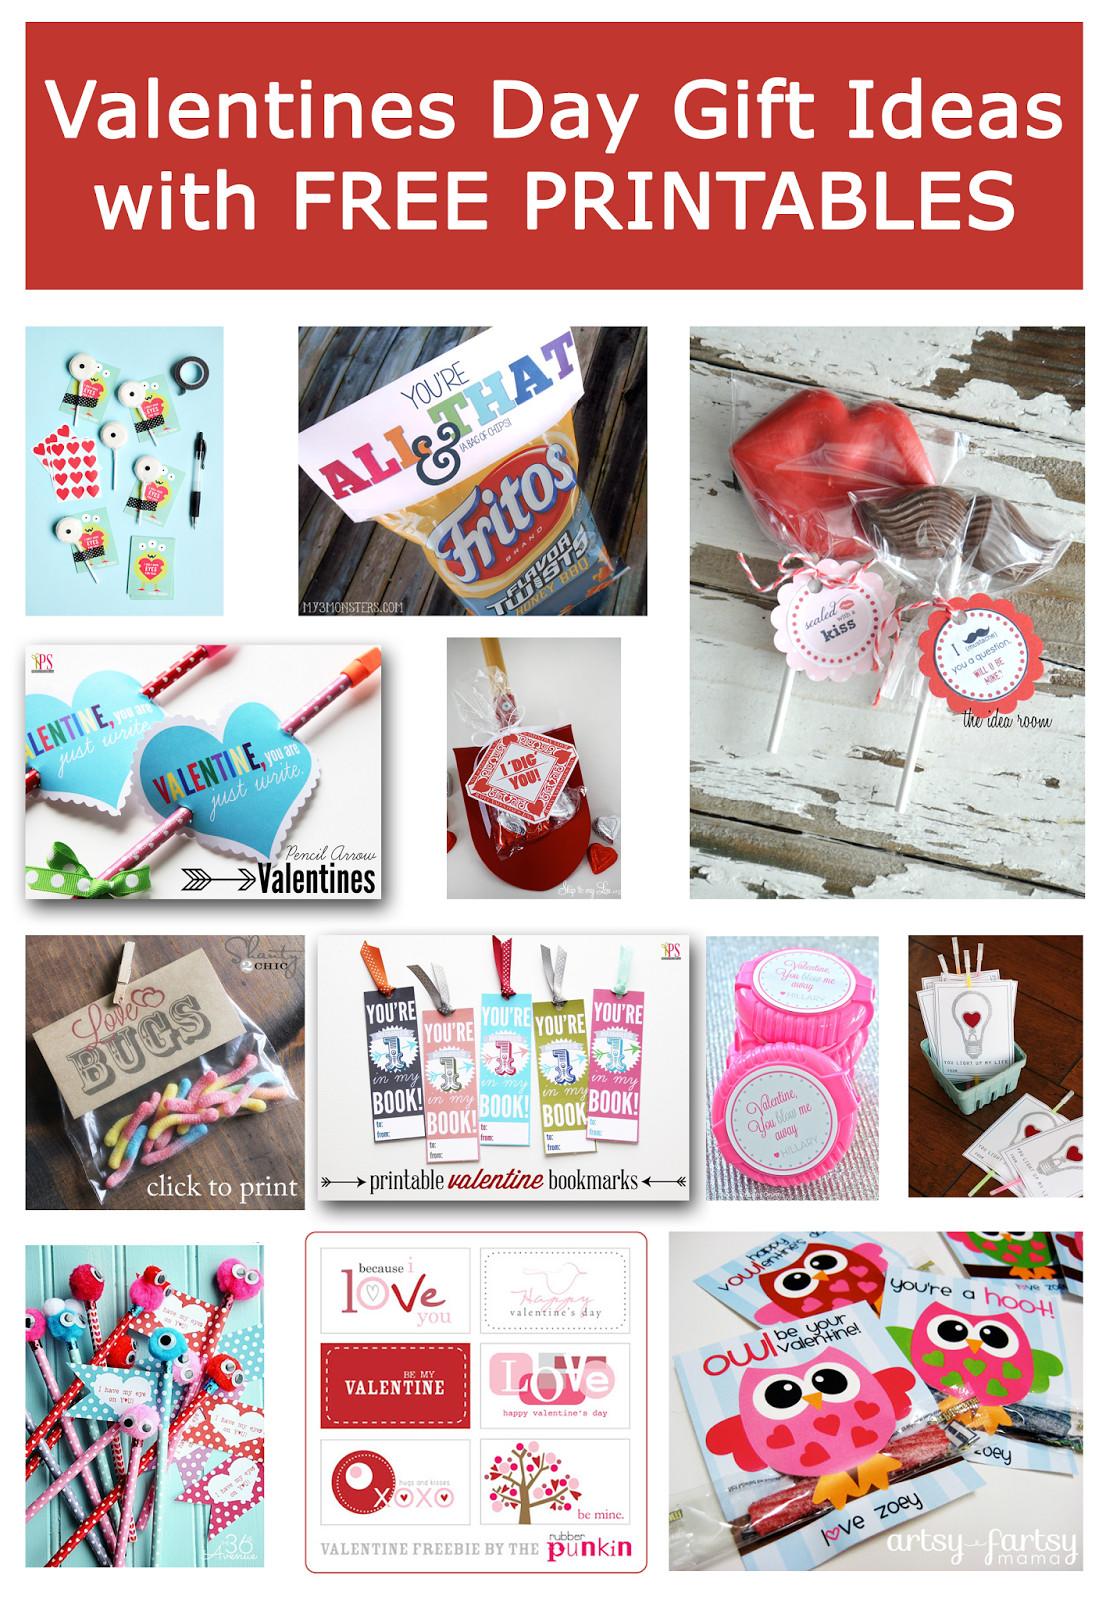 Valentines Day Gift Ideas  Delightful Order Valentines Day Gift Ideas & Free Printables